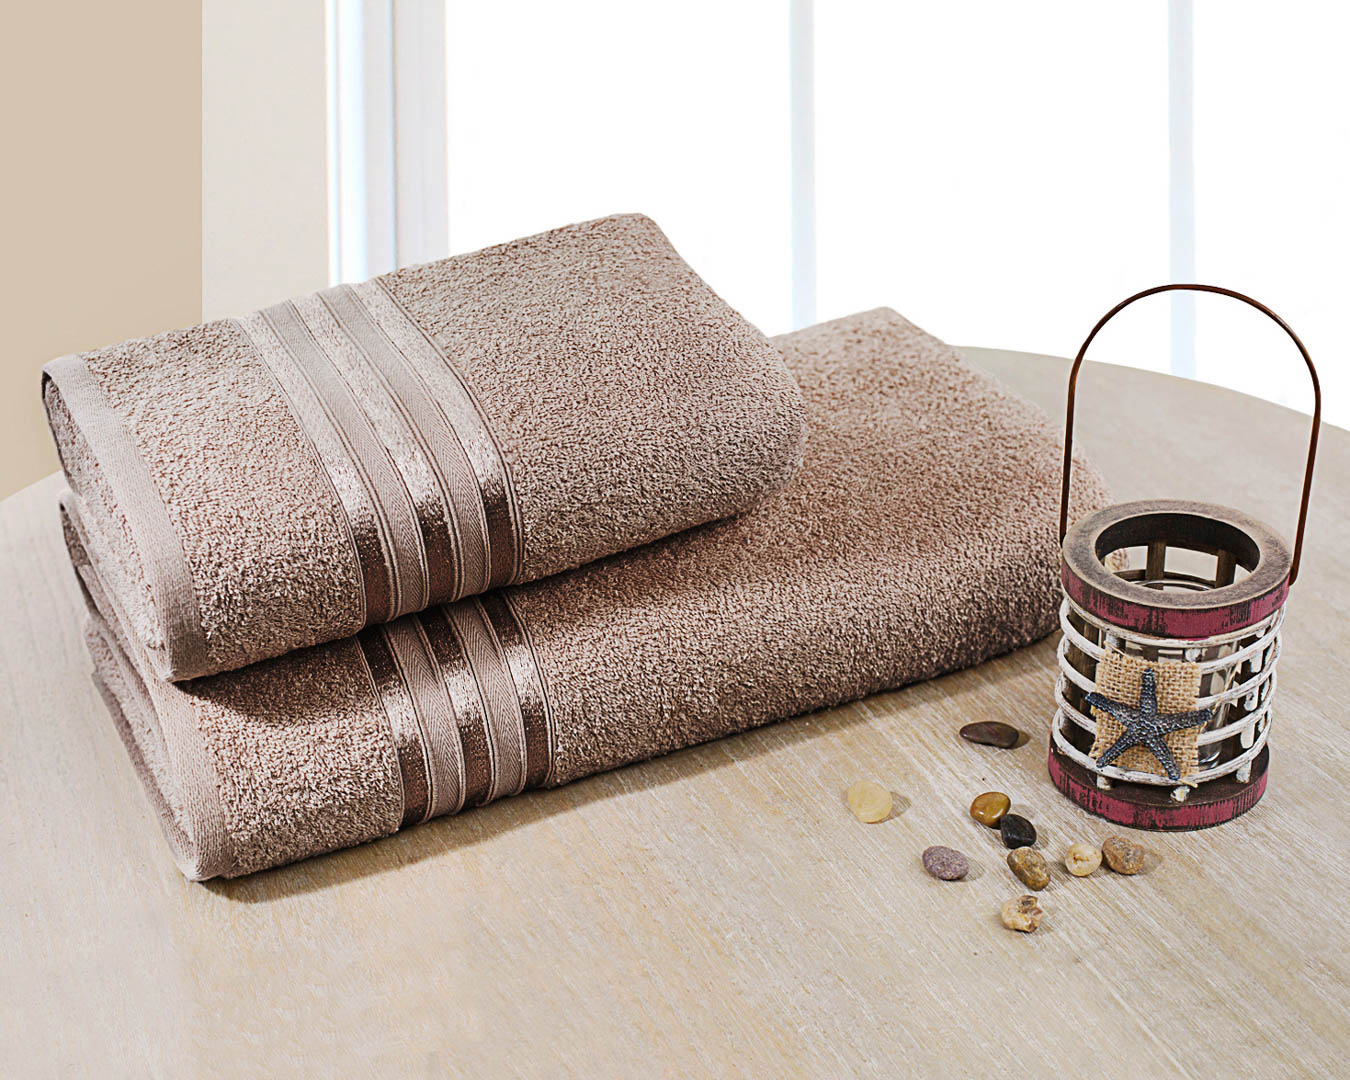 Полотенца Dome Набор из 2 полотенец Harmonika Цвет: Коричневый sikel набор из 2 полотенец nazande цвет коричневый